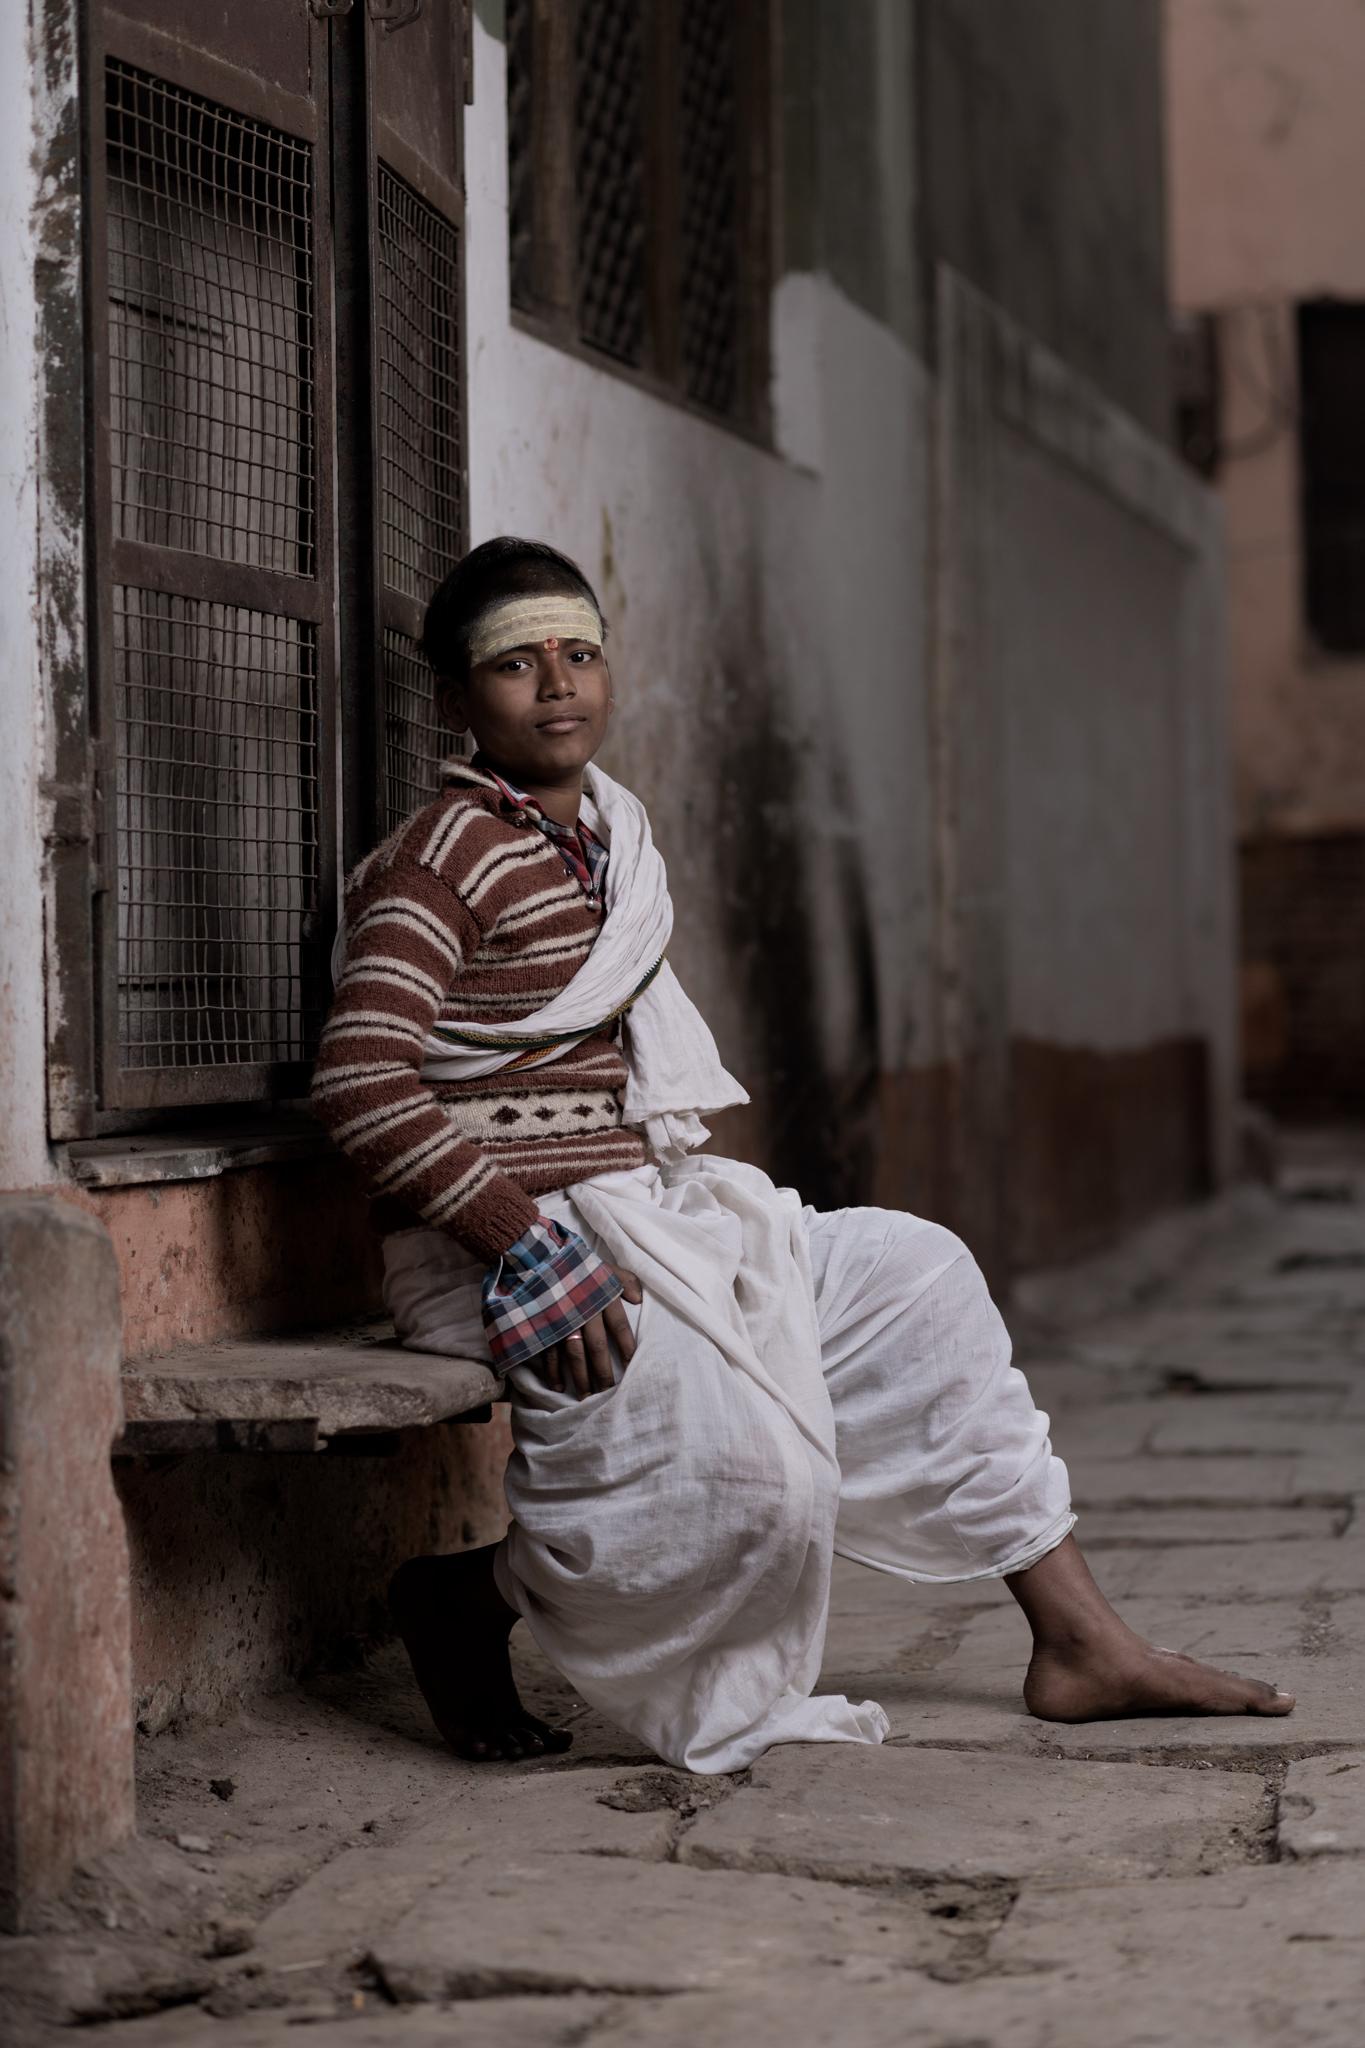 Varanasi_portrait_travel_photography_Manchester_Adventure_Photographer_Jan_Bella22.jpg